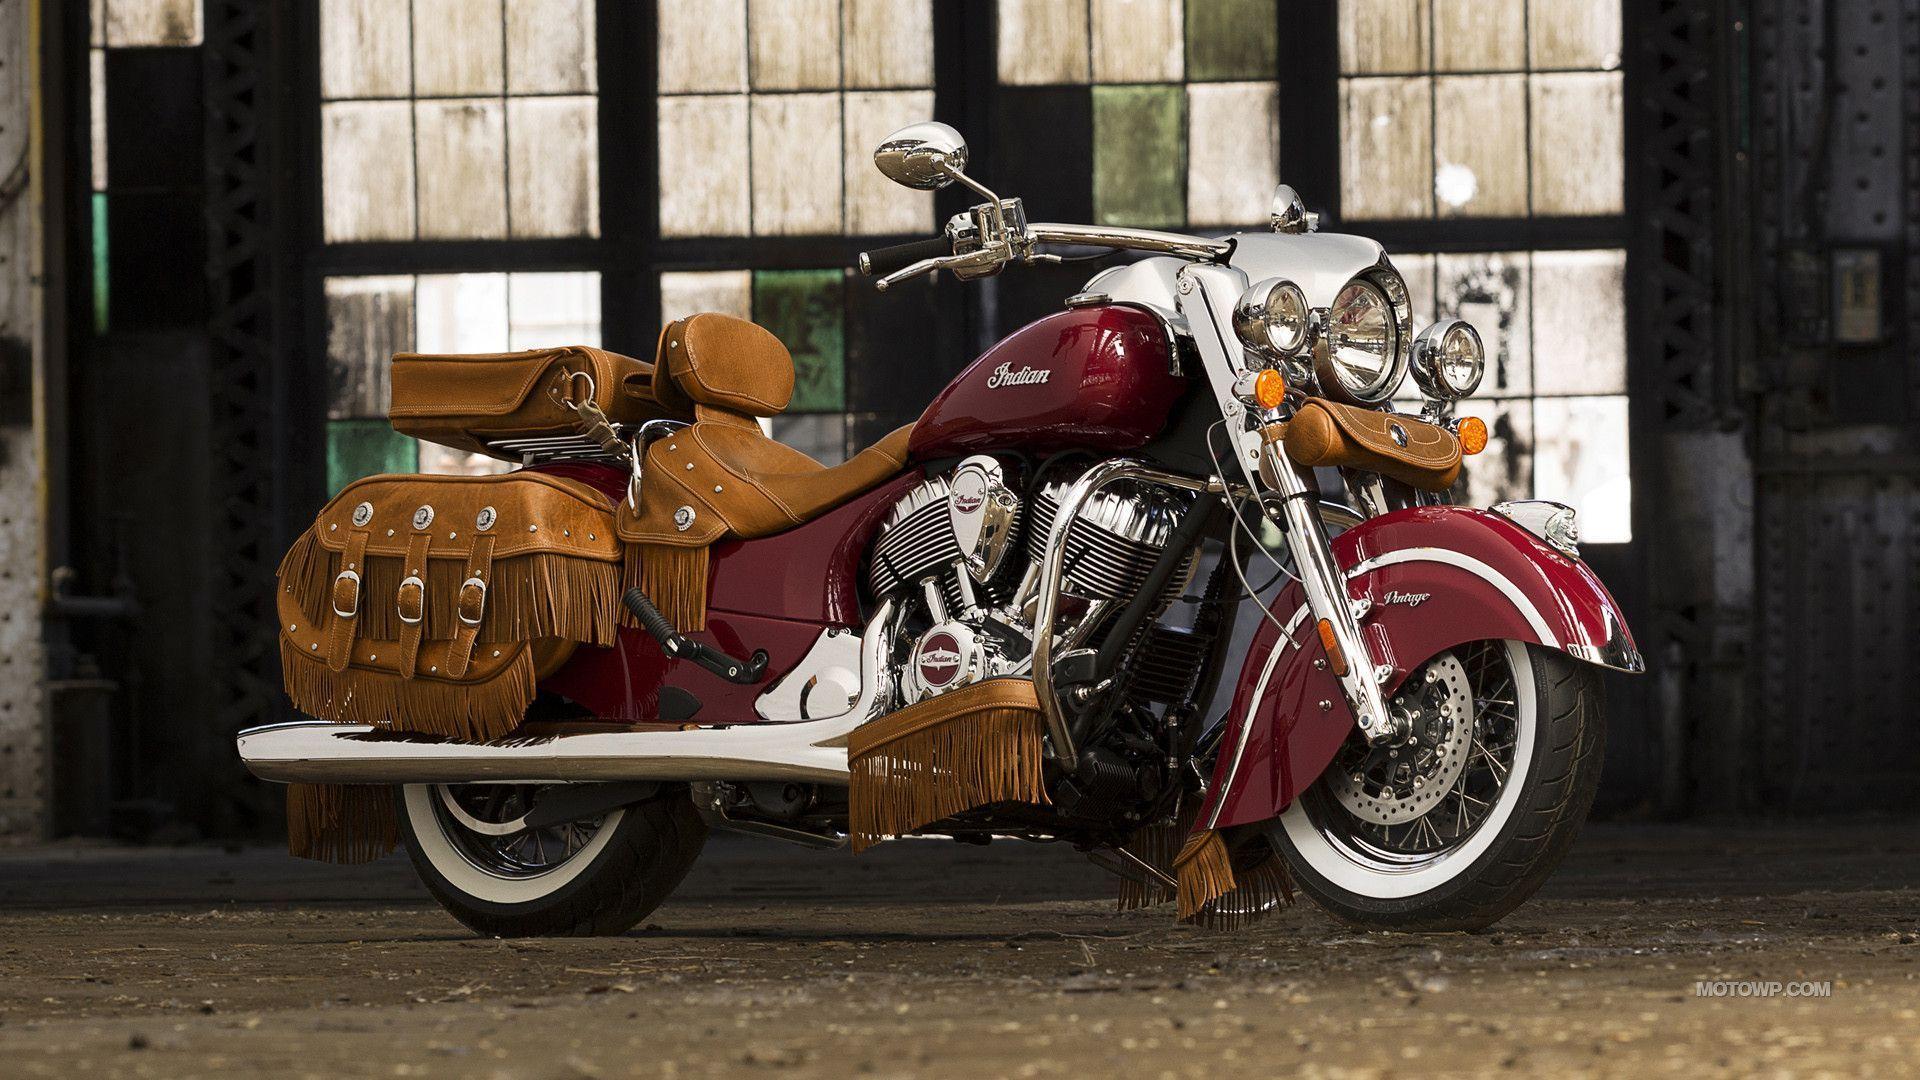 Vintage Indian Motorcycles Hd Cool 7 Hd Wallpapers Motorcycle Wallpaper Indian Motorcycle Custom Motorcycles Harley